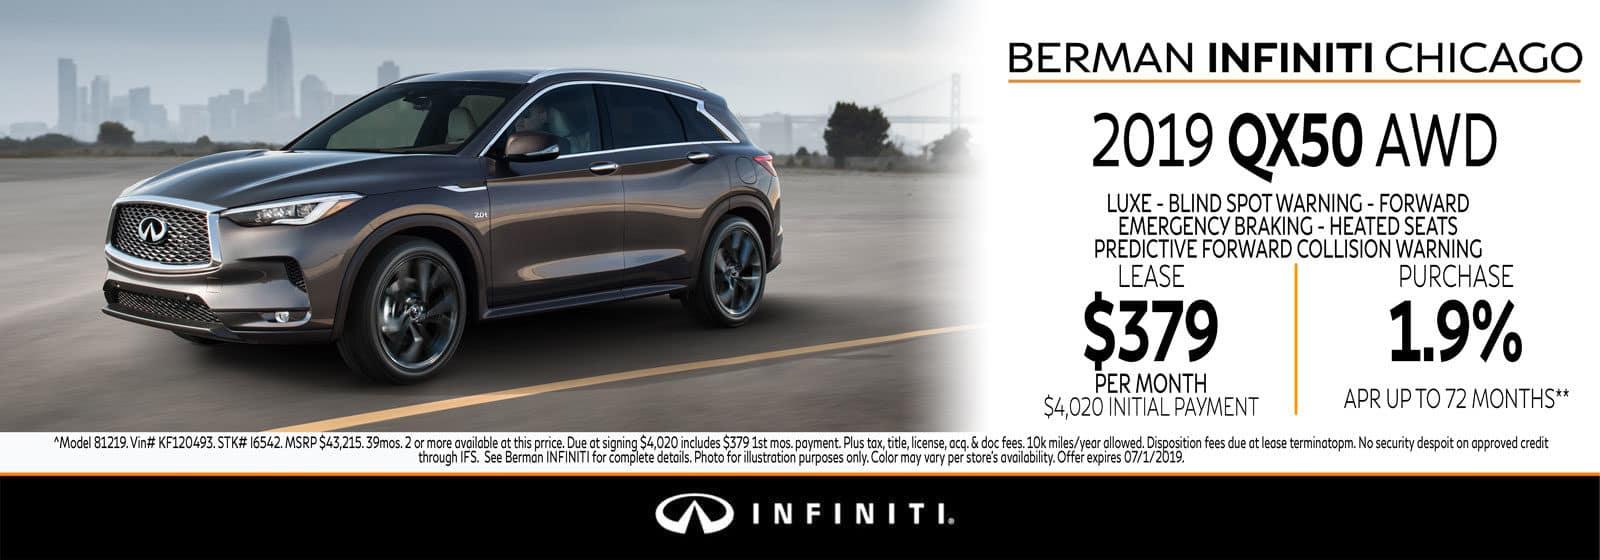 New 2019 INFINITI QX50 June offer at Berman INFINITI Chicago!